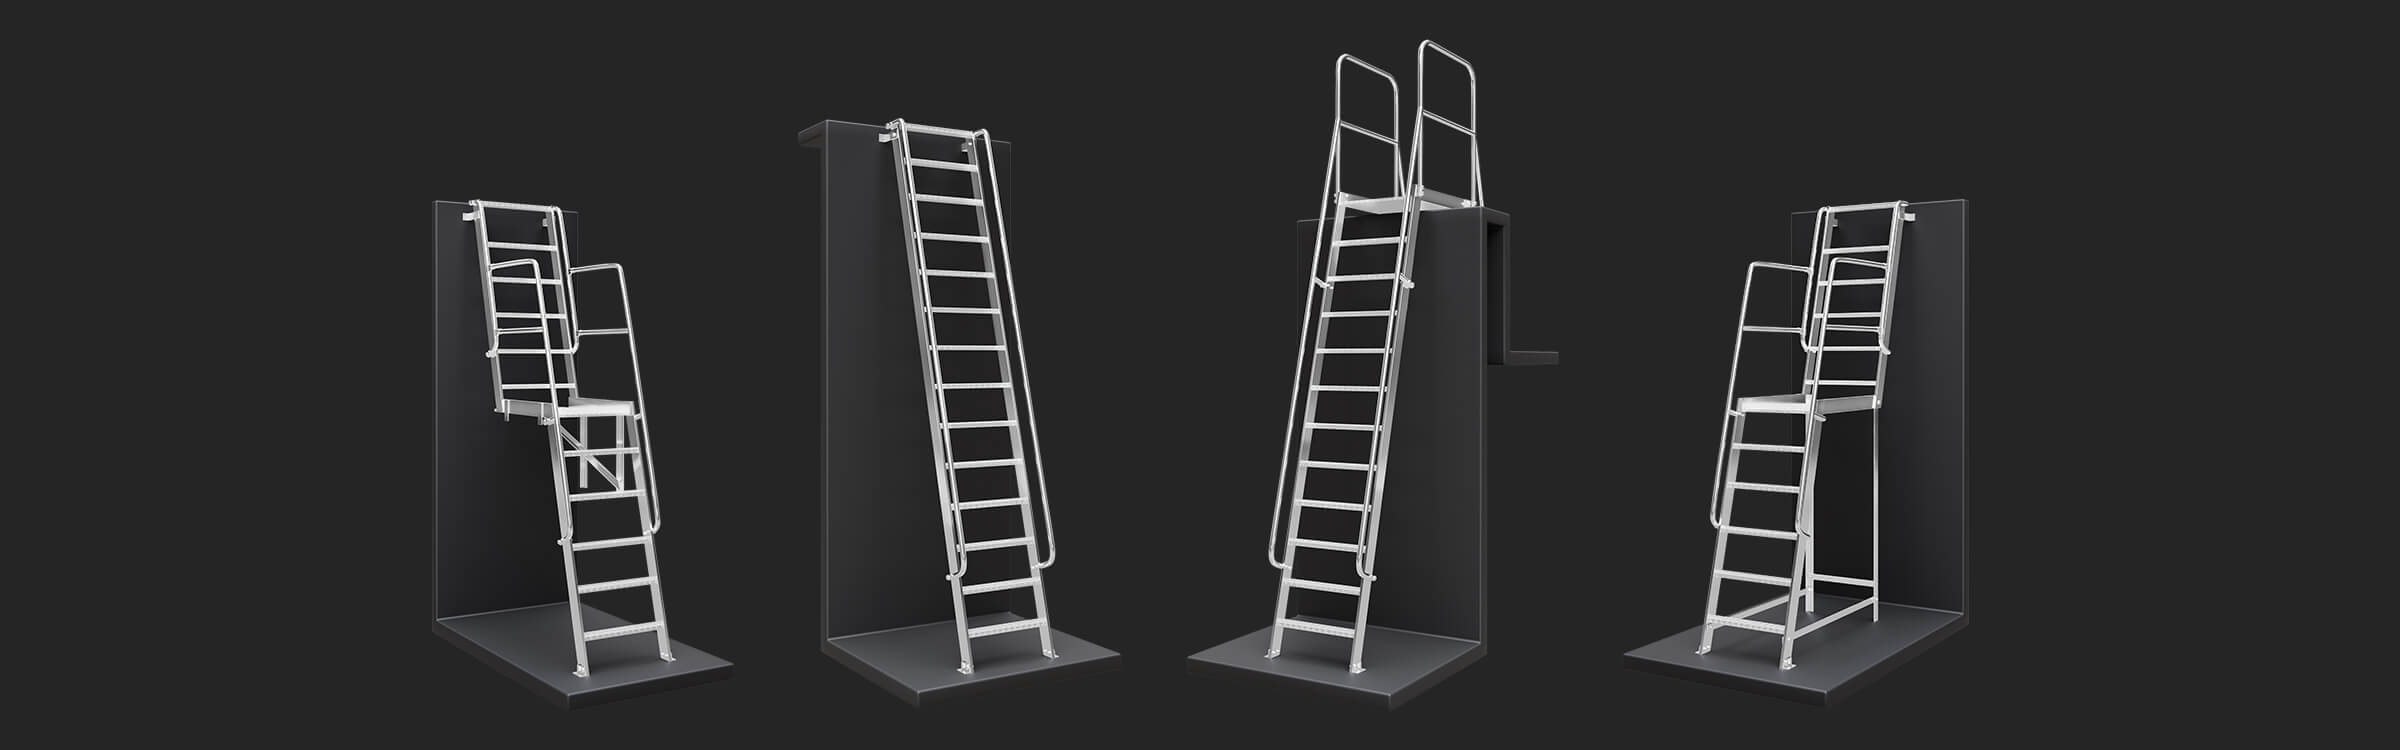 Companionway-Ladders---Banner-PNGs---Dark-2400-x-750